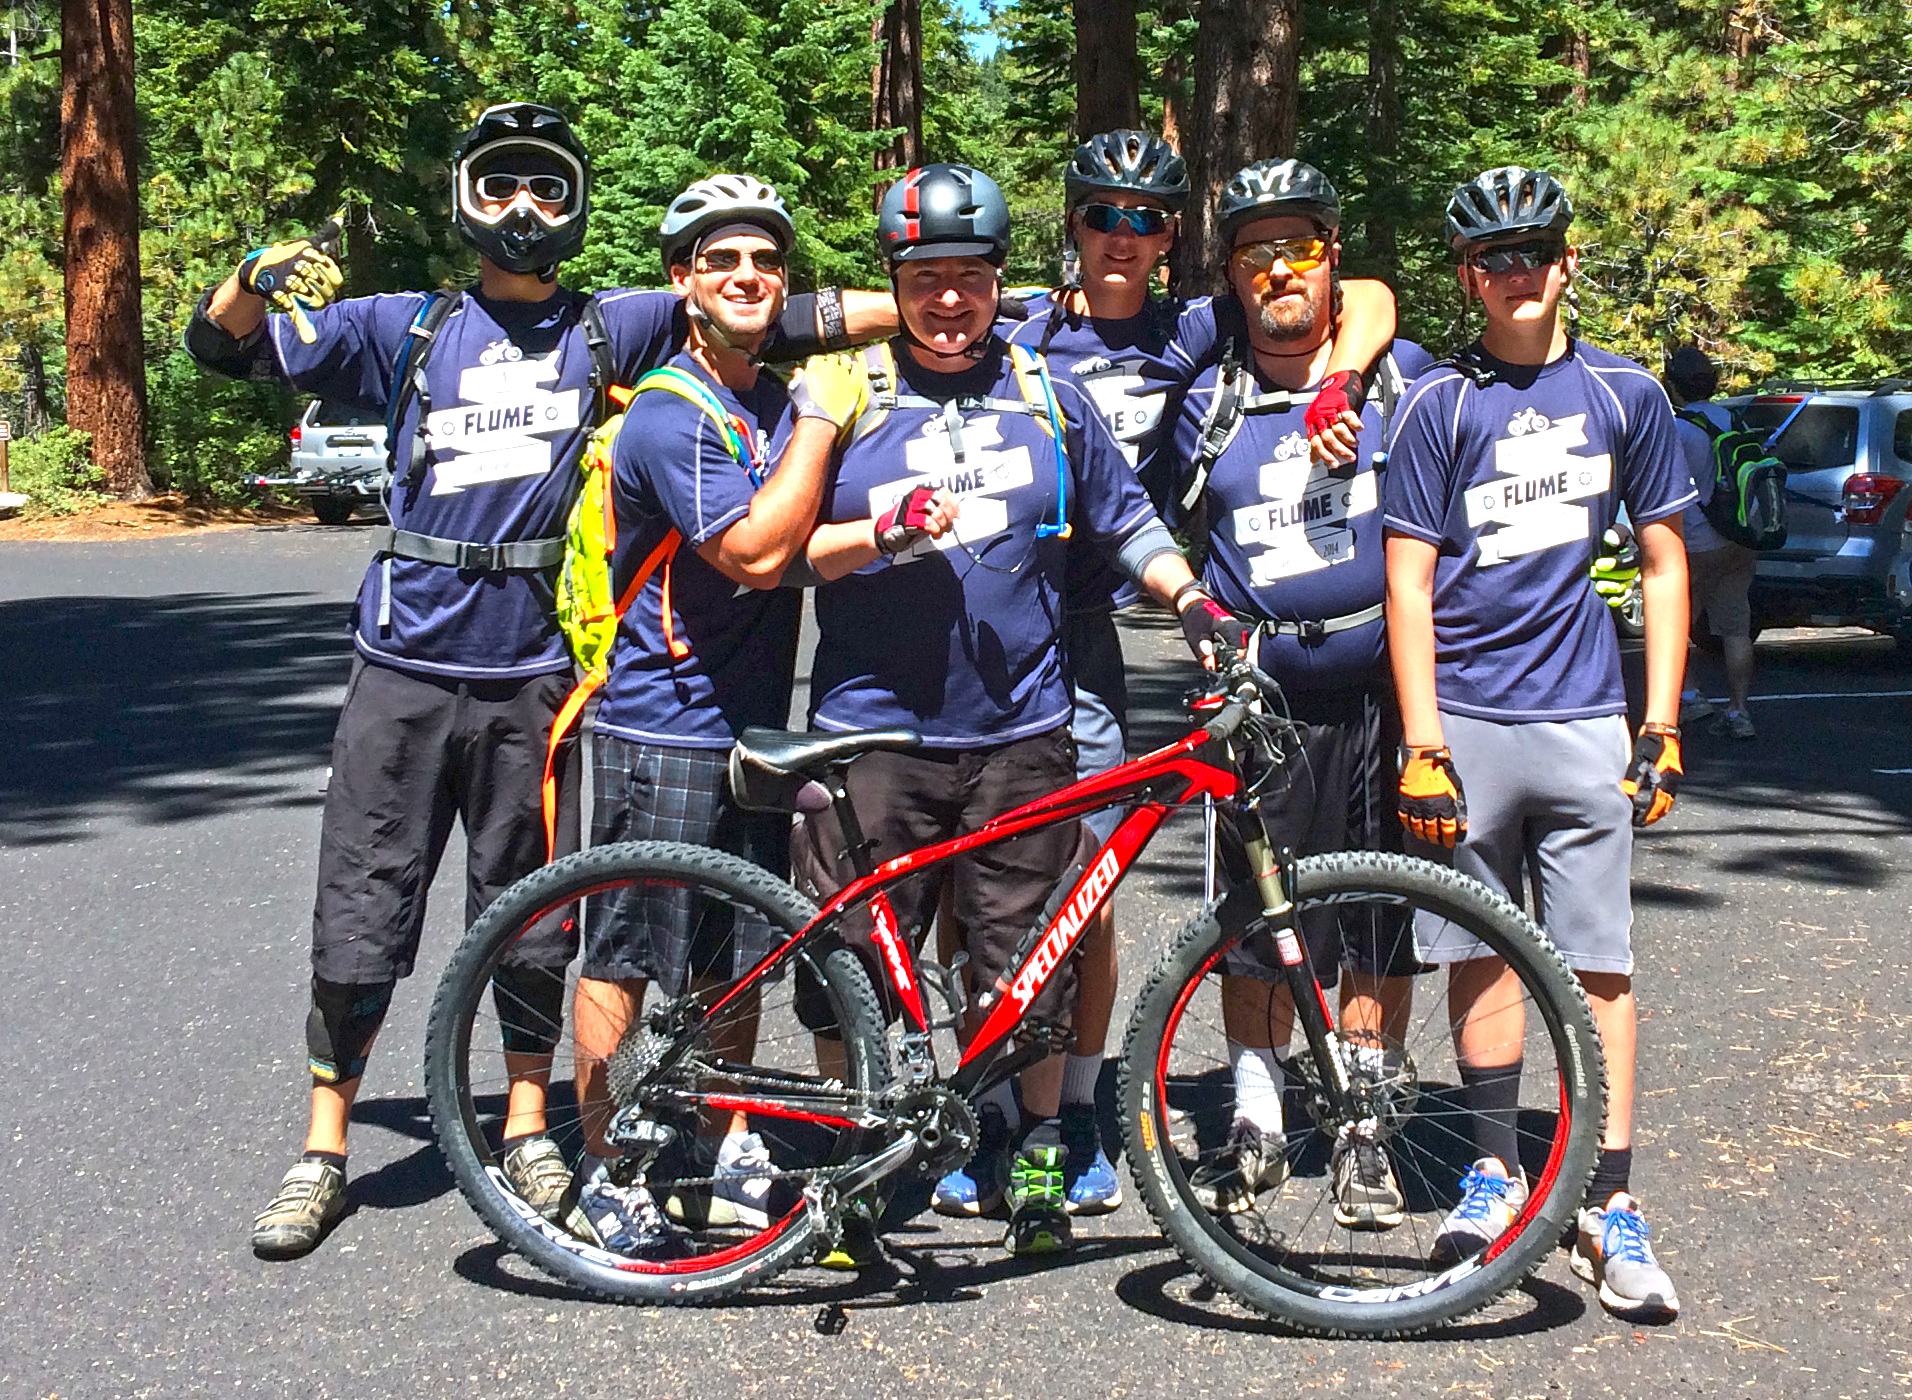 Cycling shirt design your own - Flume Trail Family Reunion Mountain Bike Event Ride T Shirt Photo